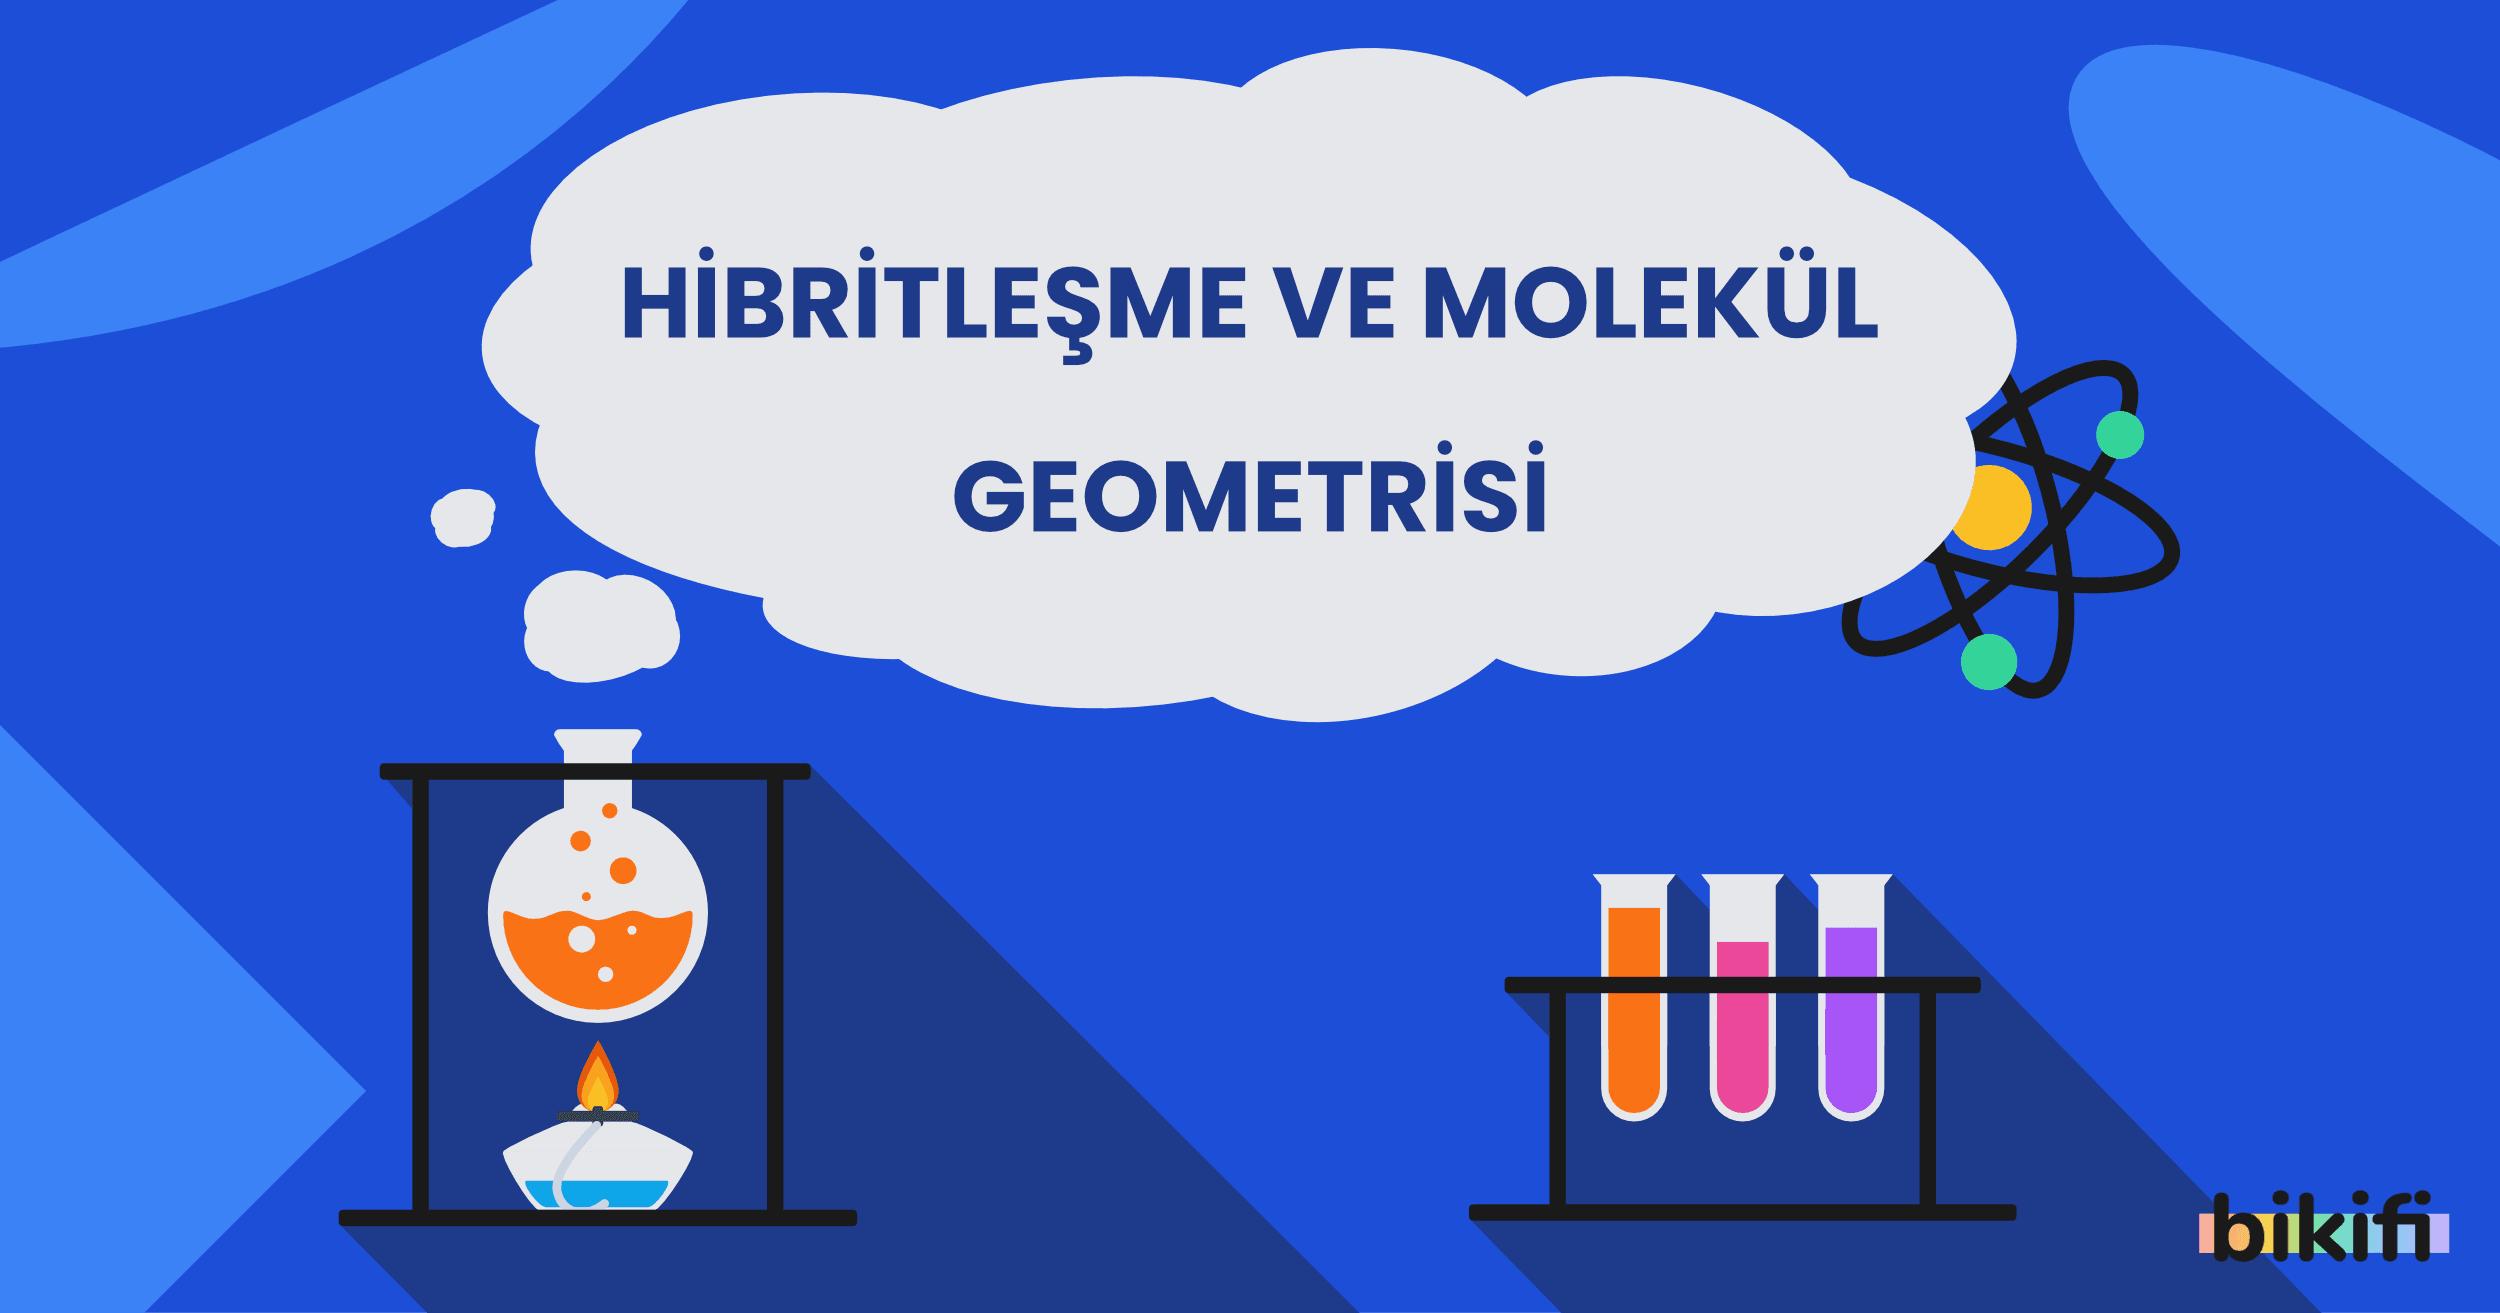 Hibritleşme ve Molekül Geometrisi